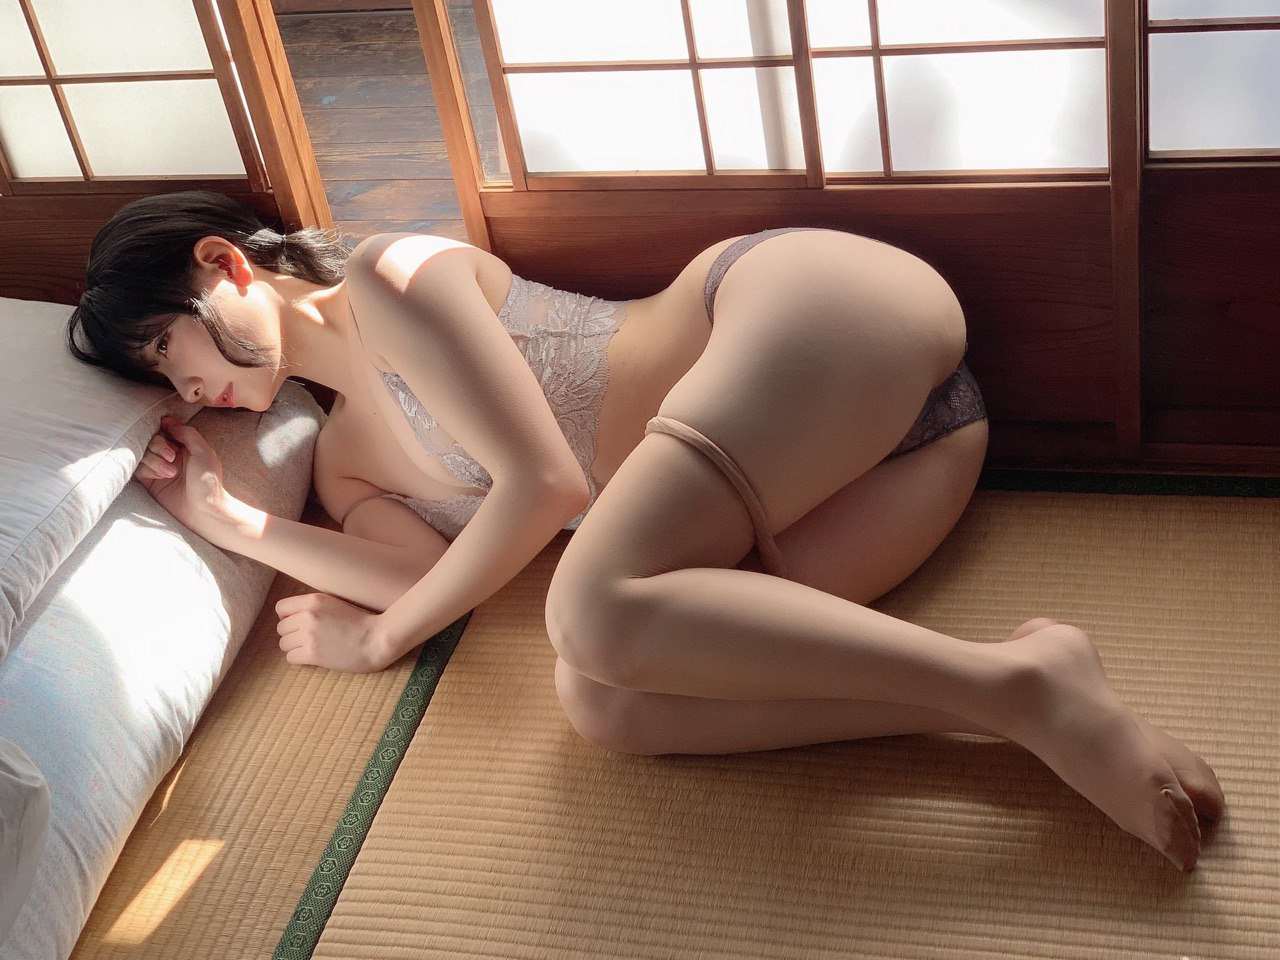 photo_4293@10-06-2020_22-30-30.jpg